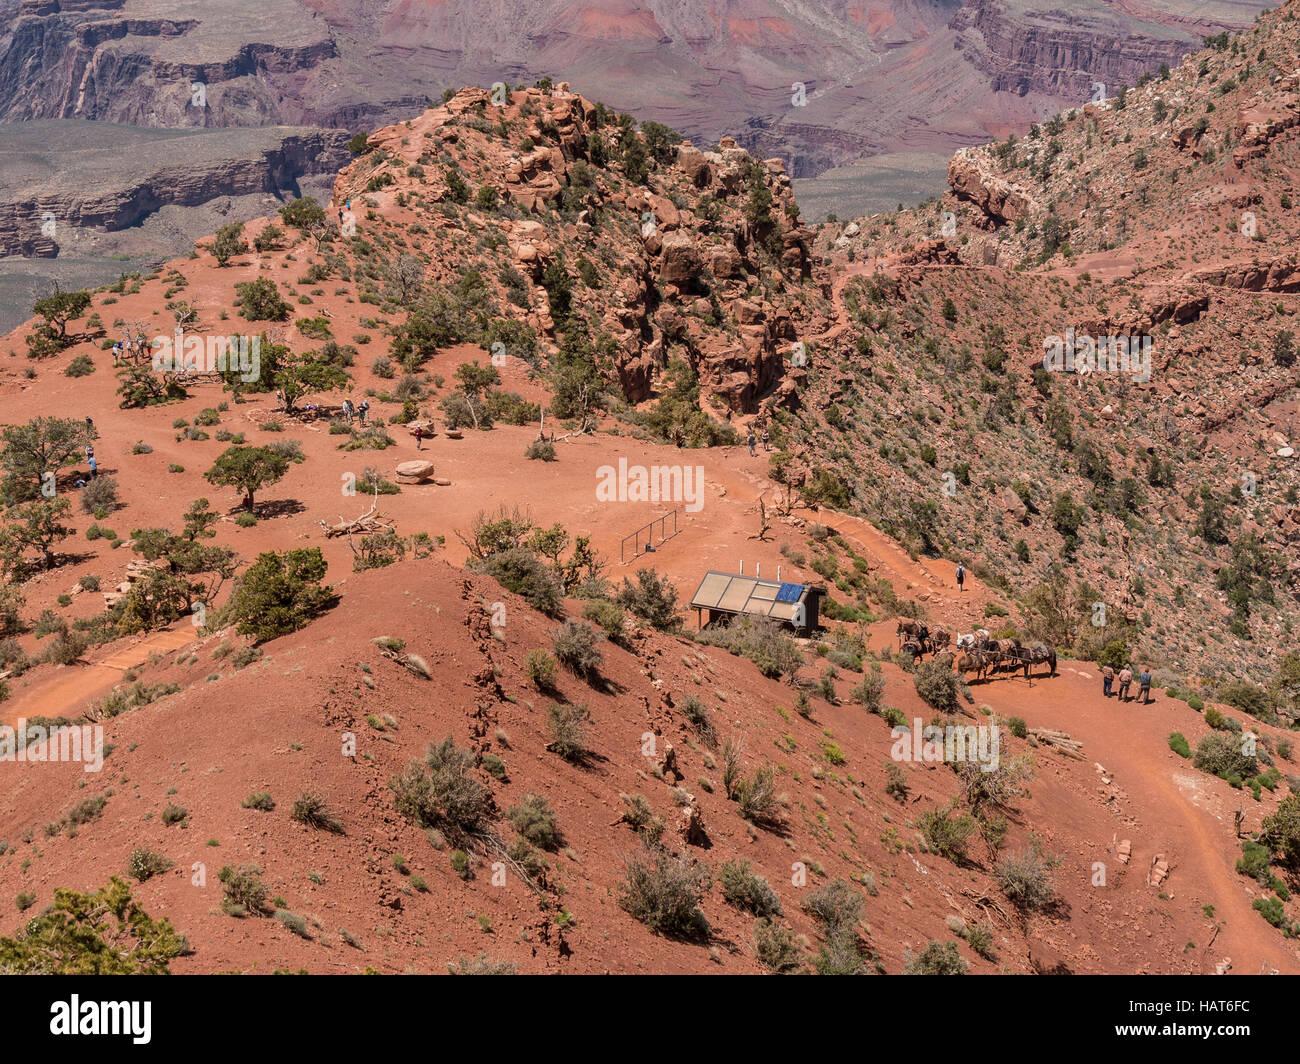 Looking down on Cedar Ridge, South Kaibab Trail, Grand Canyon South Rim, Arizona. - Stock Image